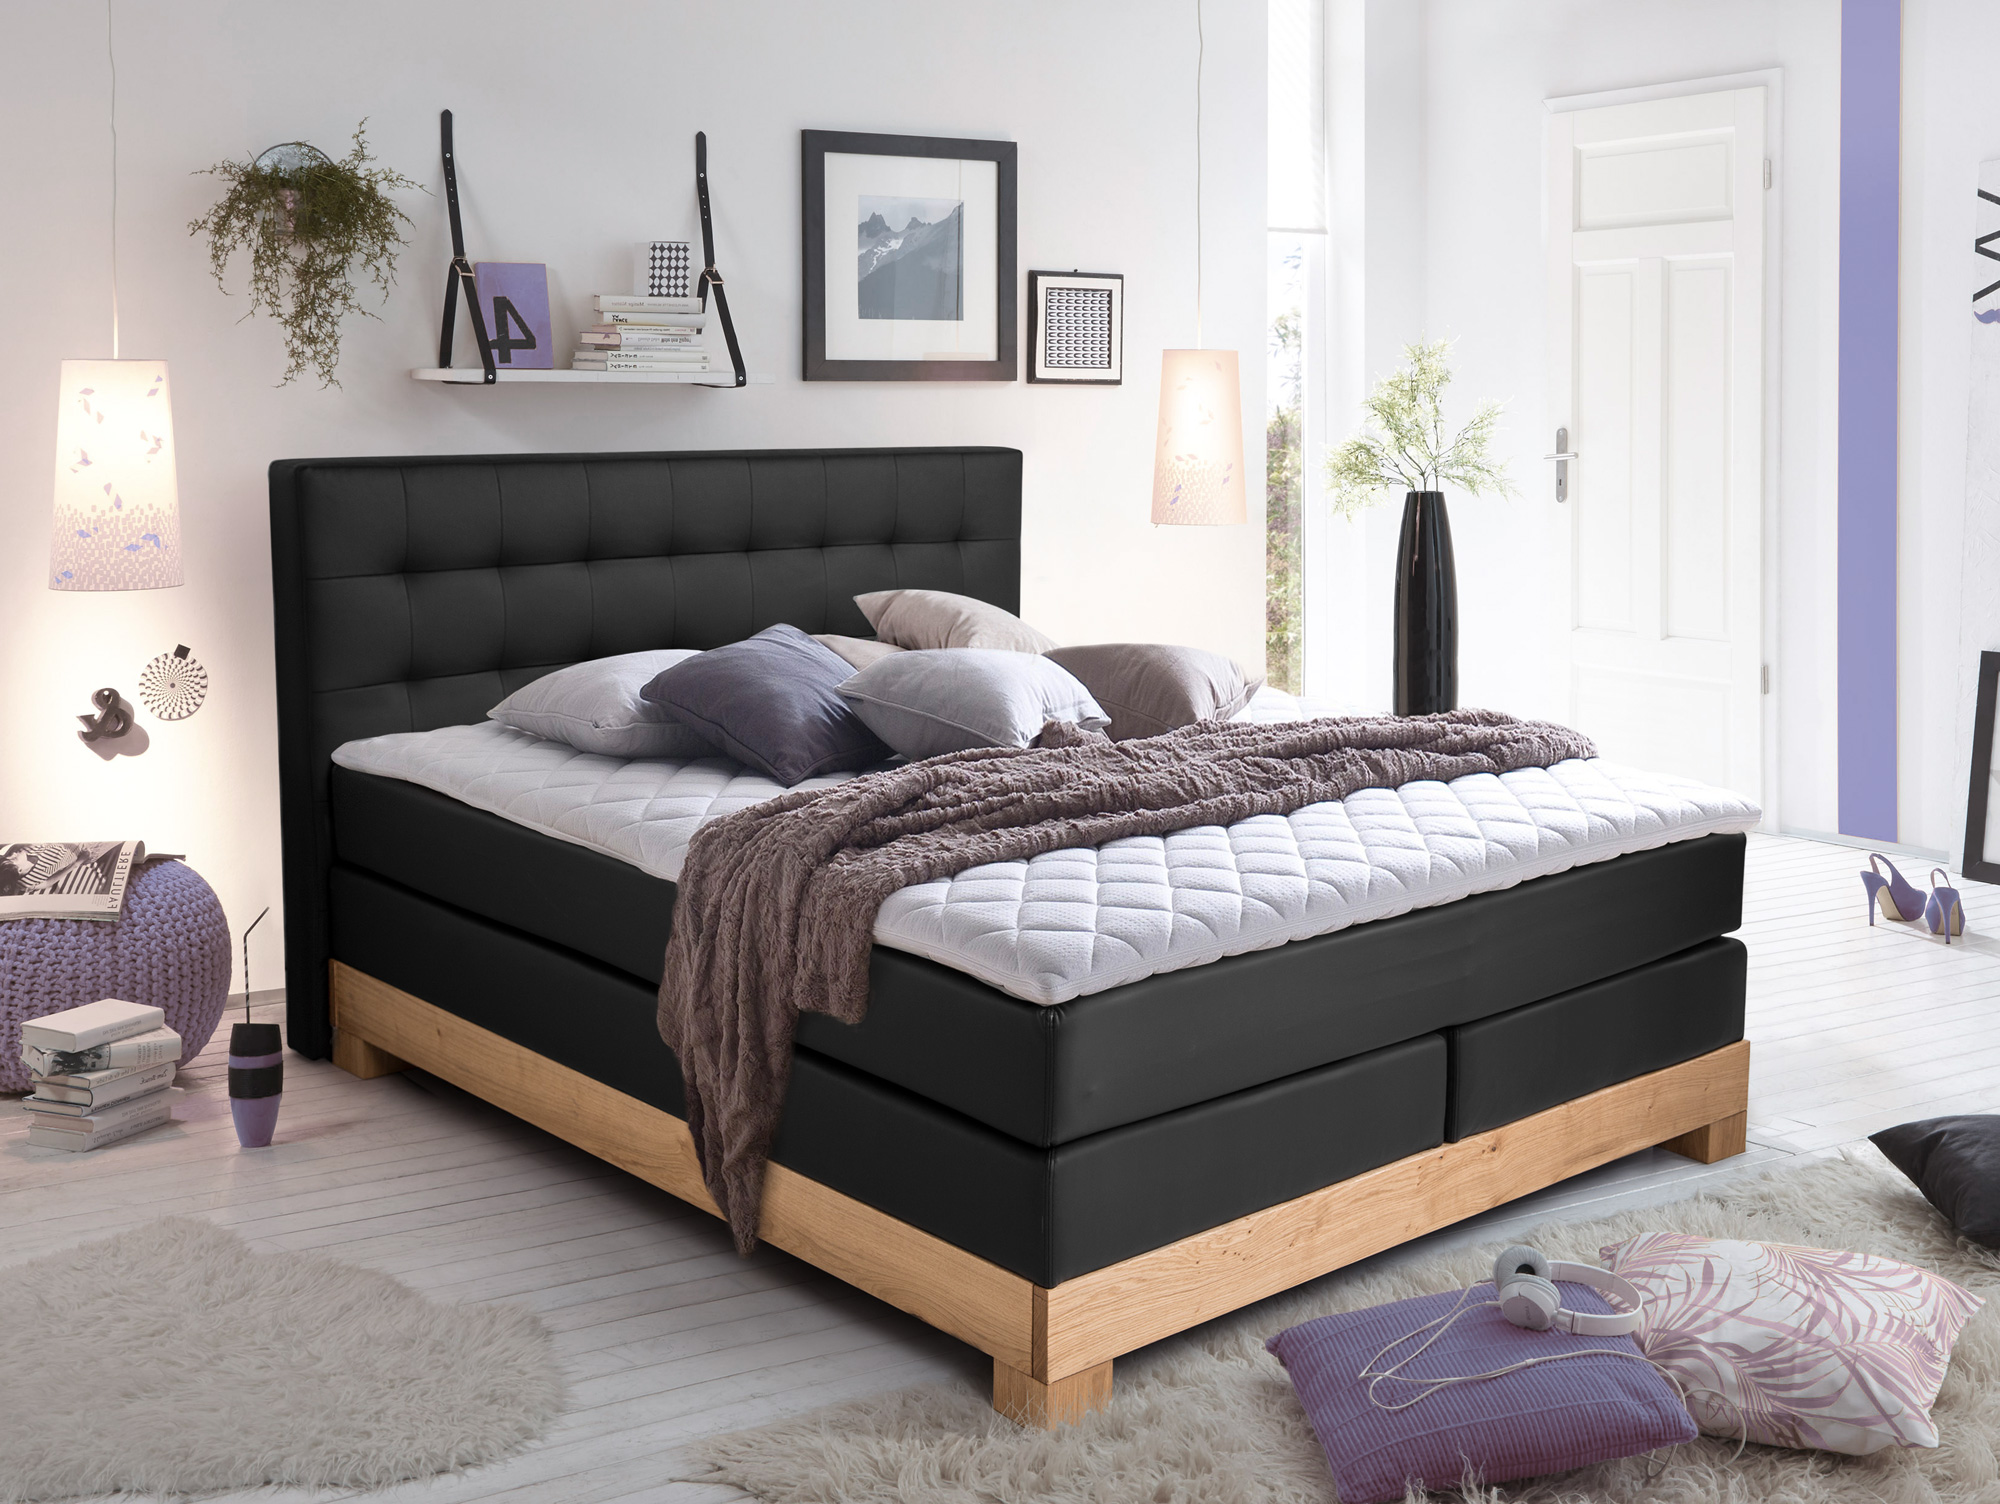 arche boxspringbett mit massivholzrahmen 200 x 200 cm schwarz eiche h rtegrad 2. Black Bedroom Furniture Sets. Home Design Ideas